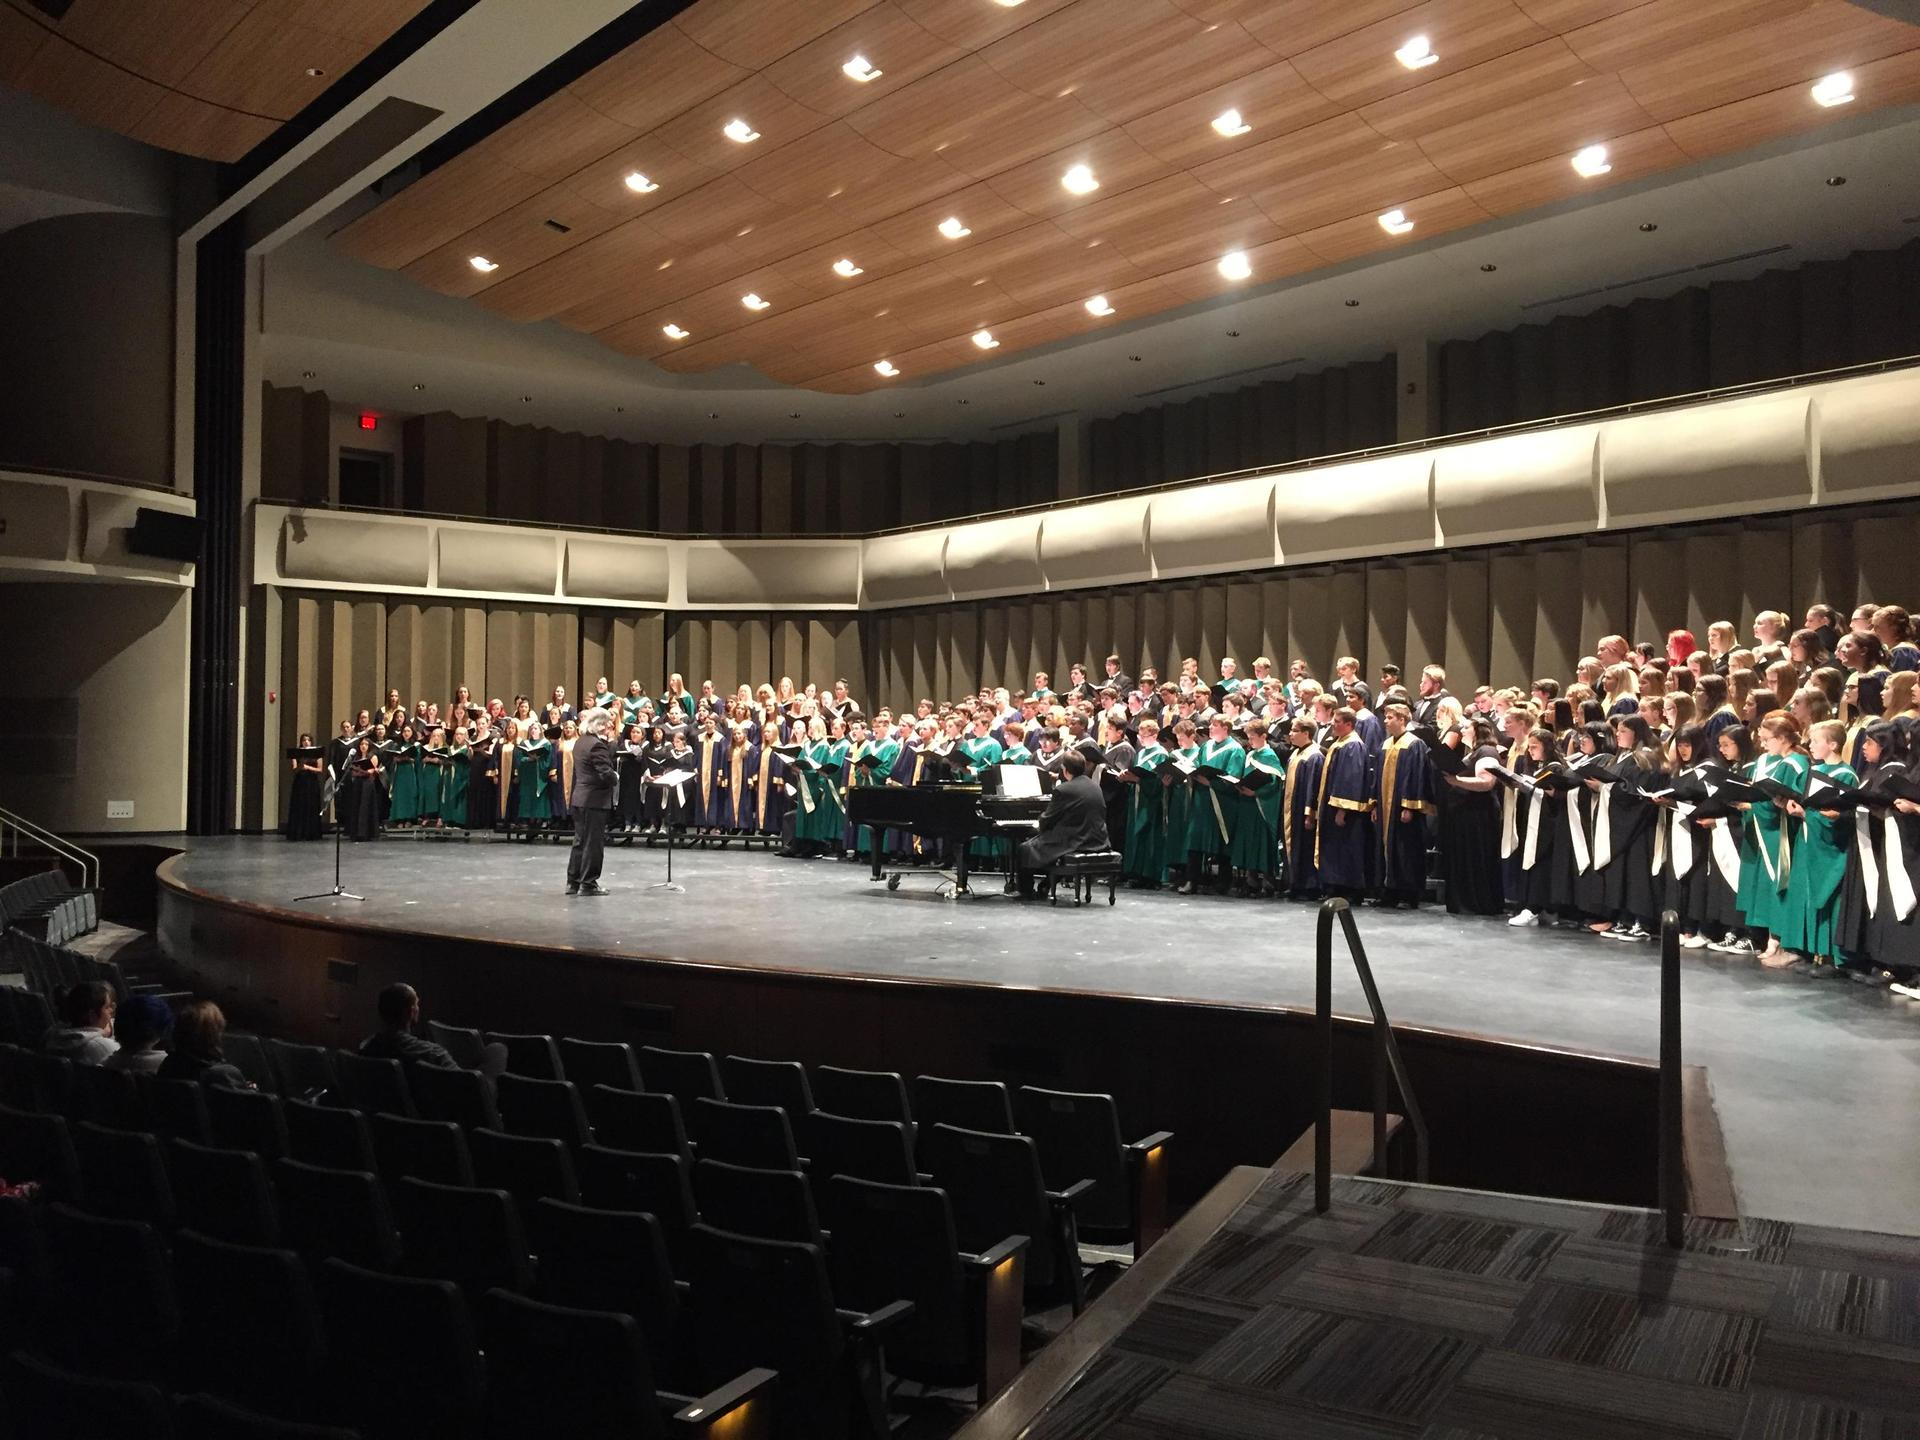 Group Photo of Choral Symposium